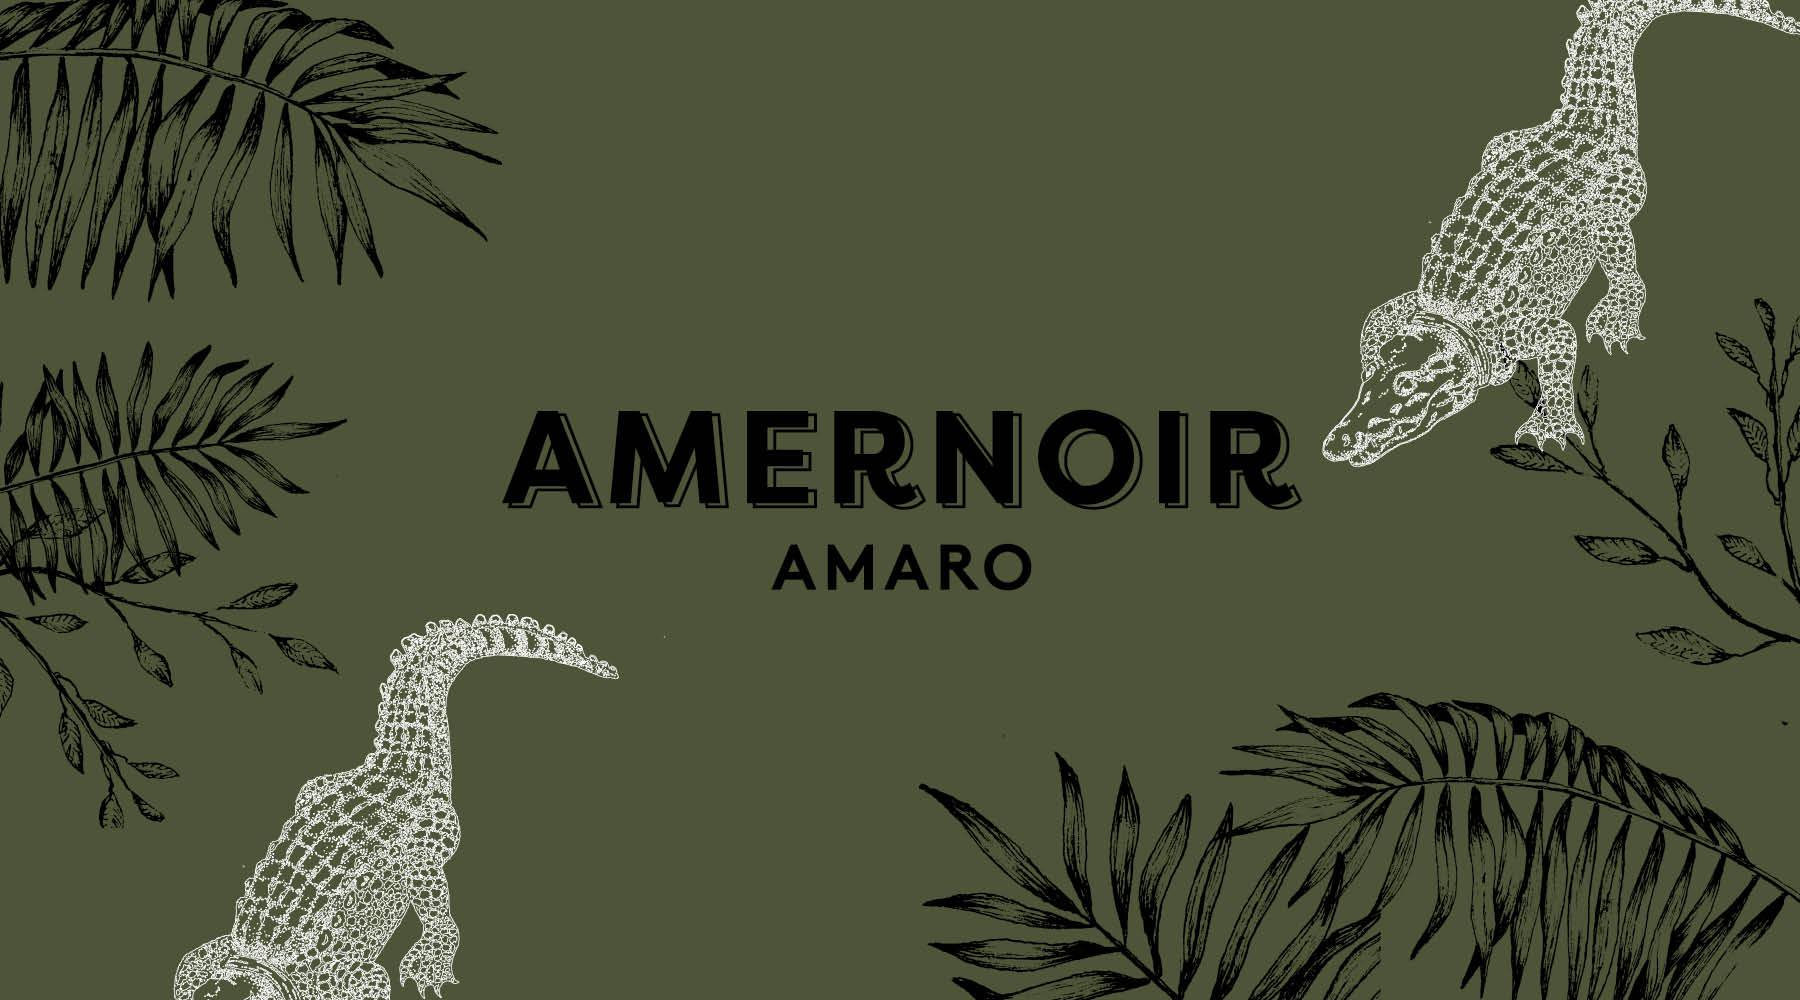 Amernoir